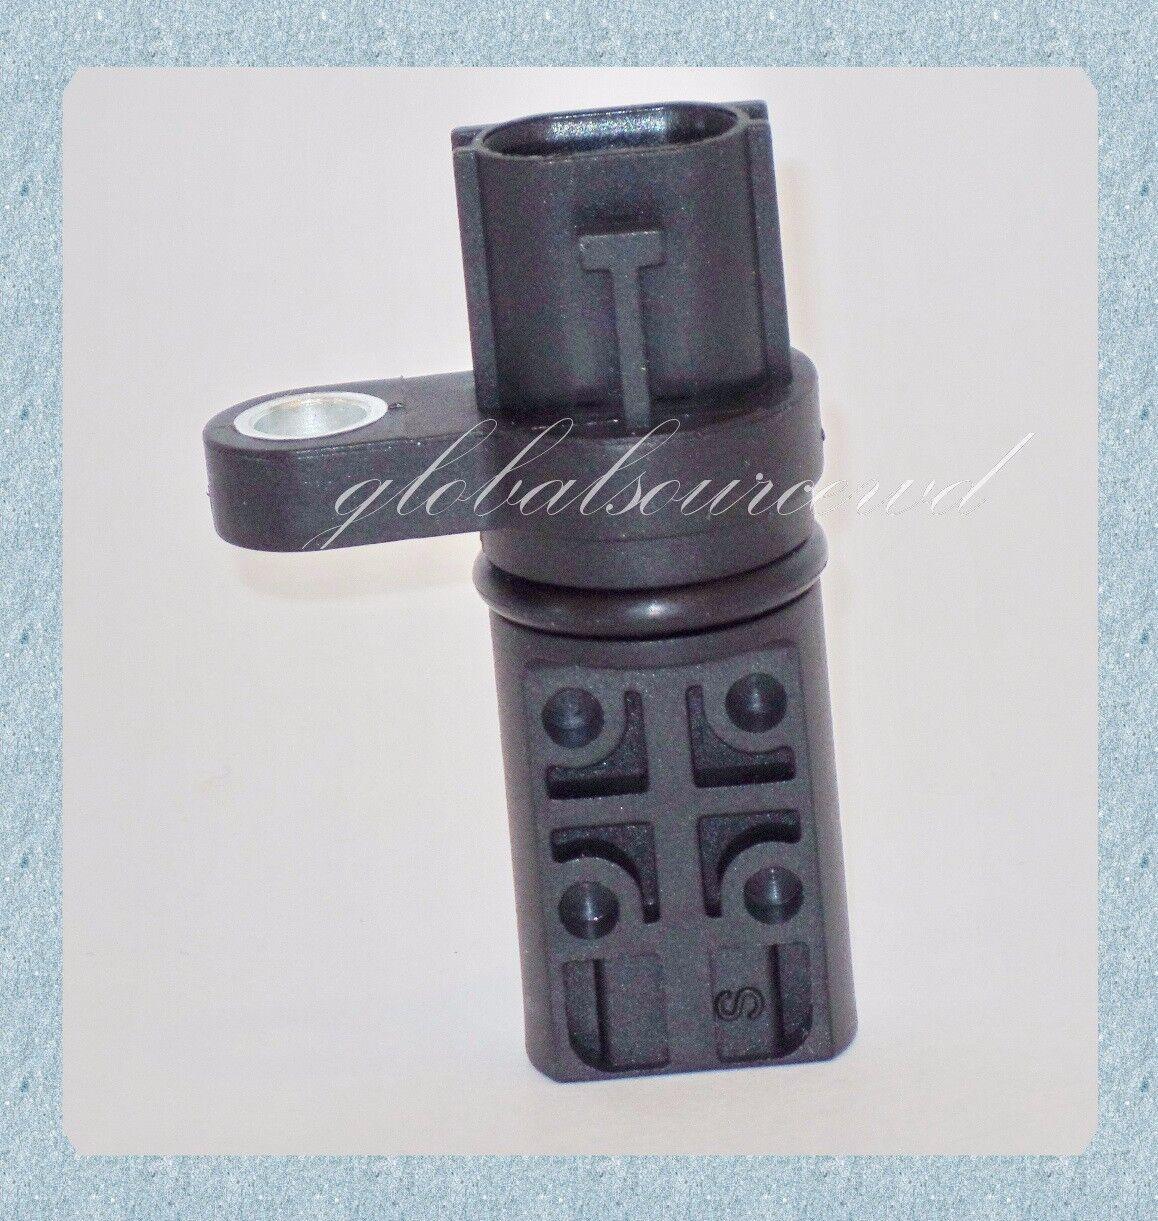 Camshaft Position Sensor Fits: Infiniti FX35 I35 G35 M35